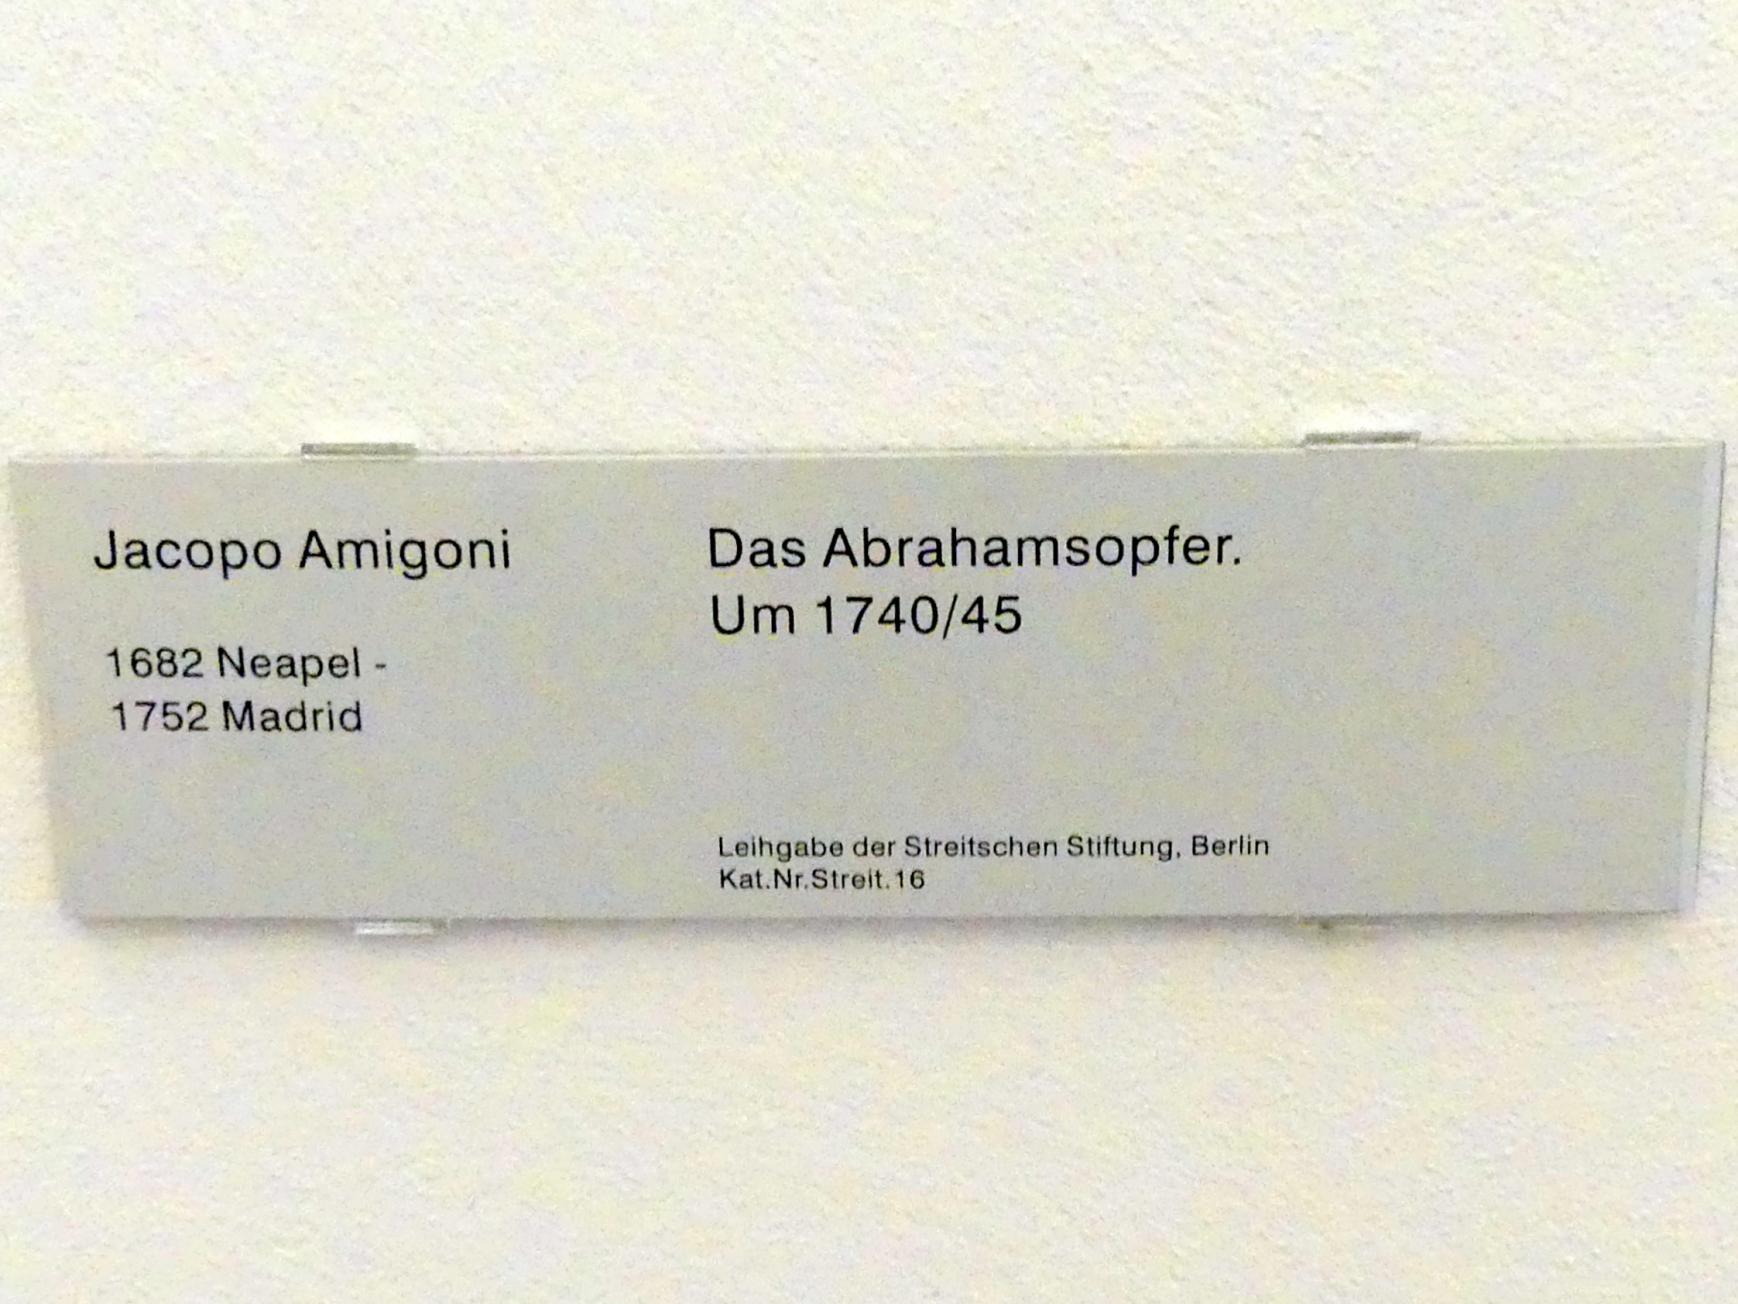 Jacopo Amigoni: Das Abrahamsopfer, um 1740 - 1745, Bild 2/2